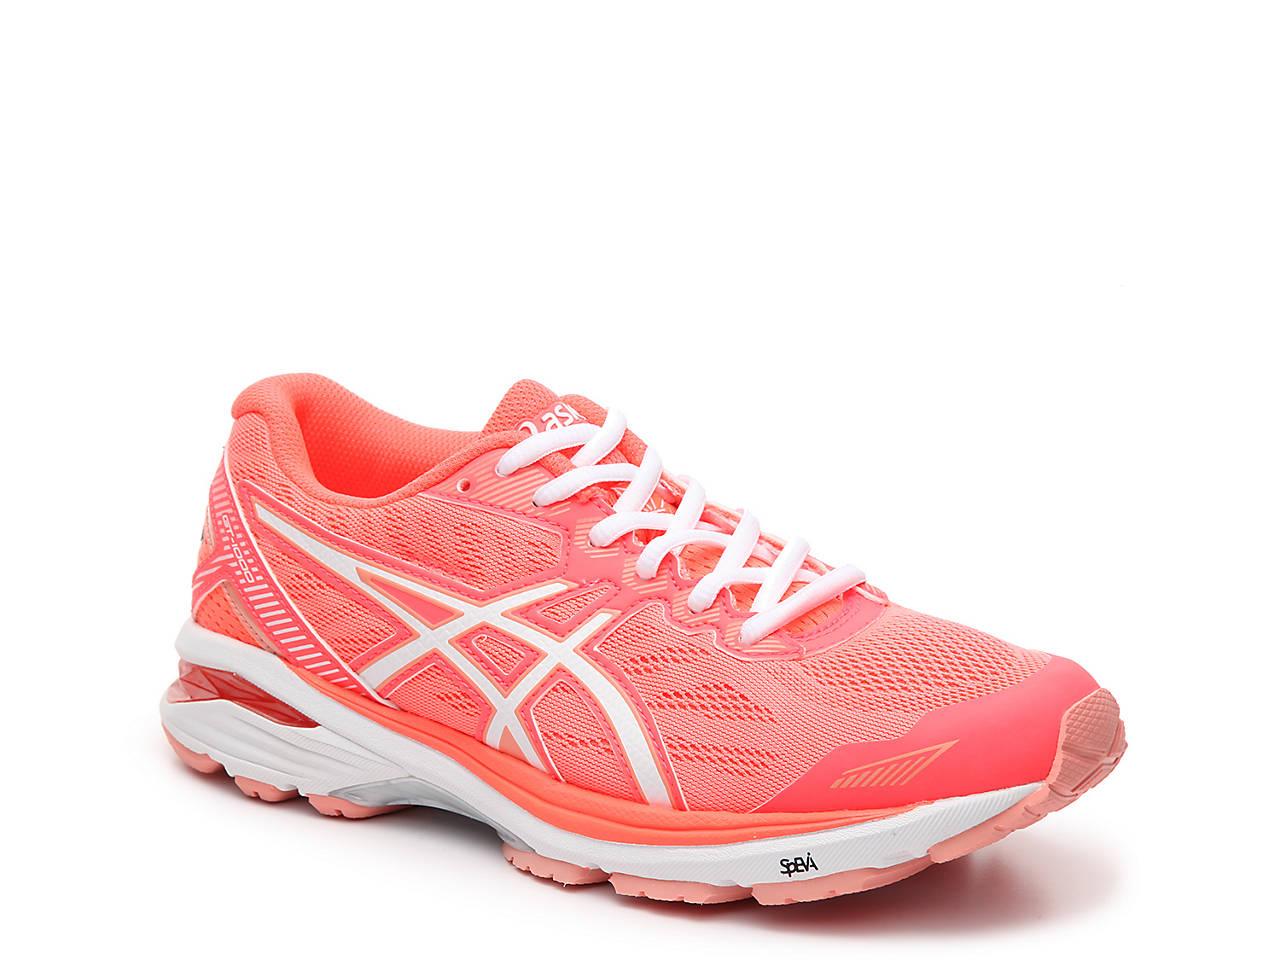 san francisco 91b11 bba99 ASICS. GT-1000 5 Performance Running Shoe - Women s